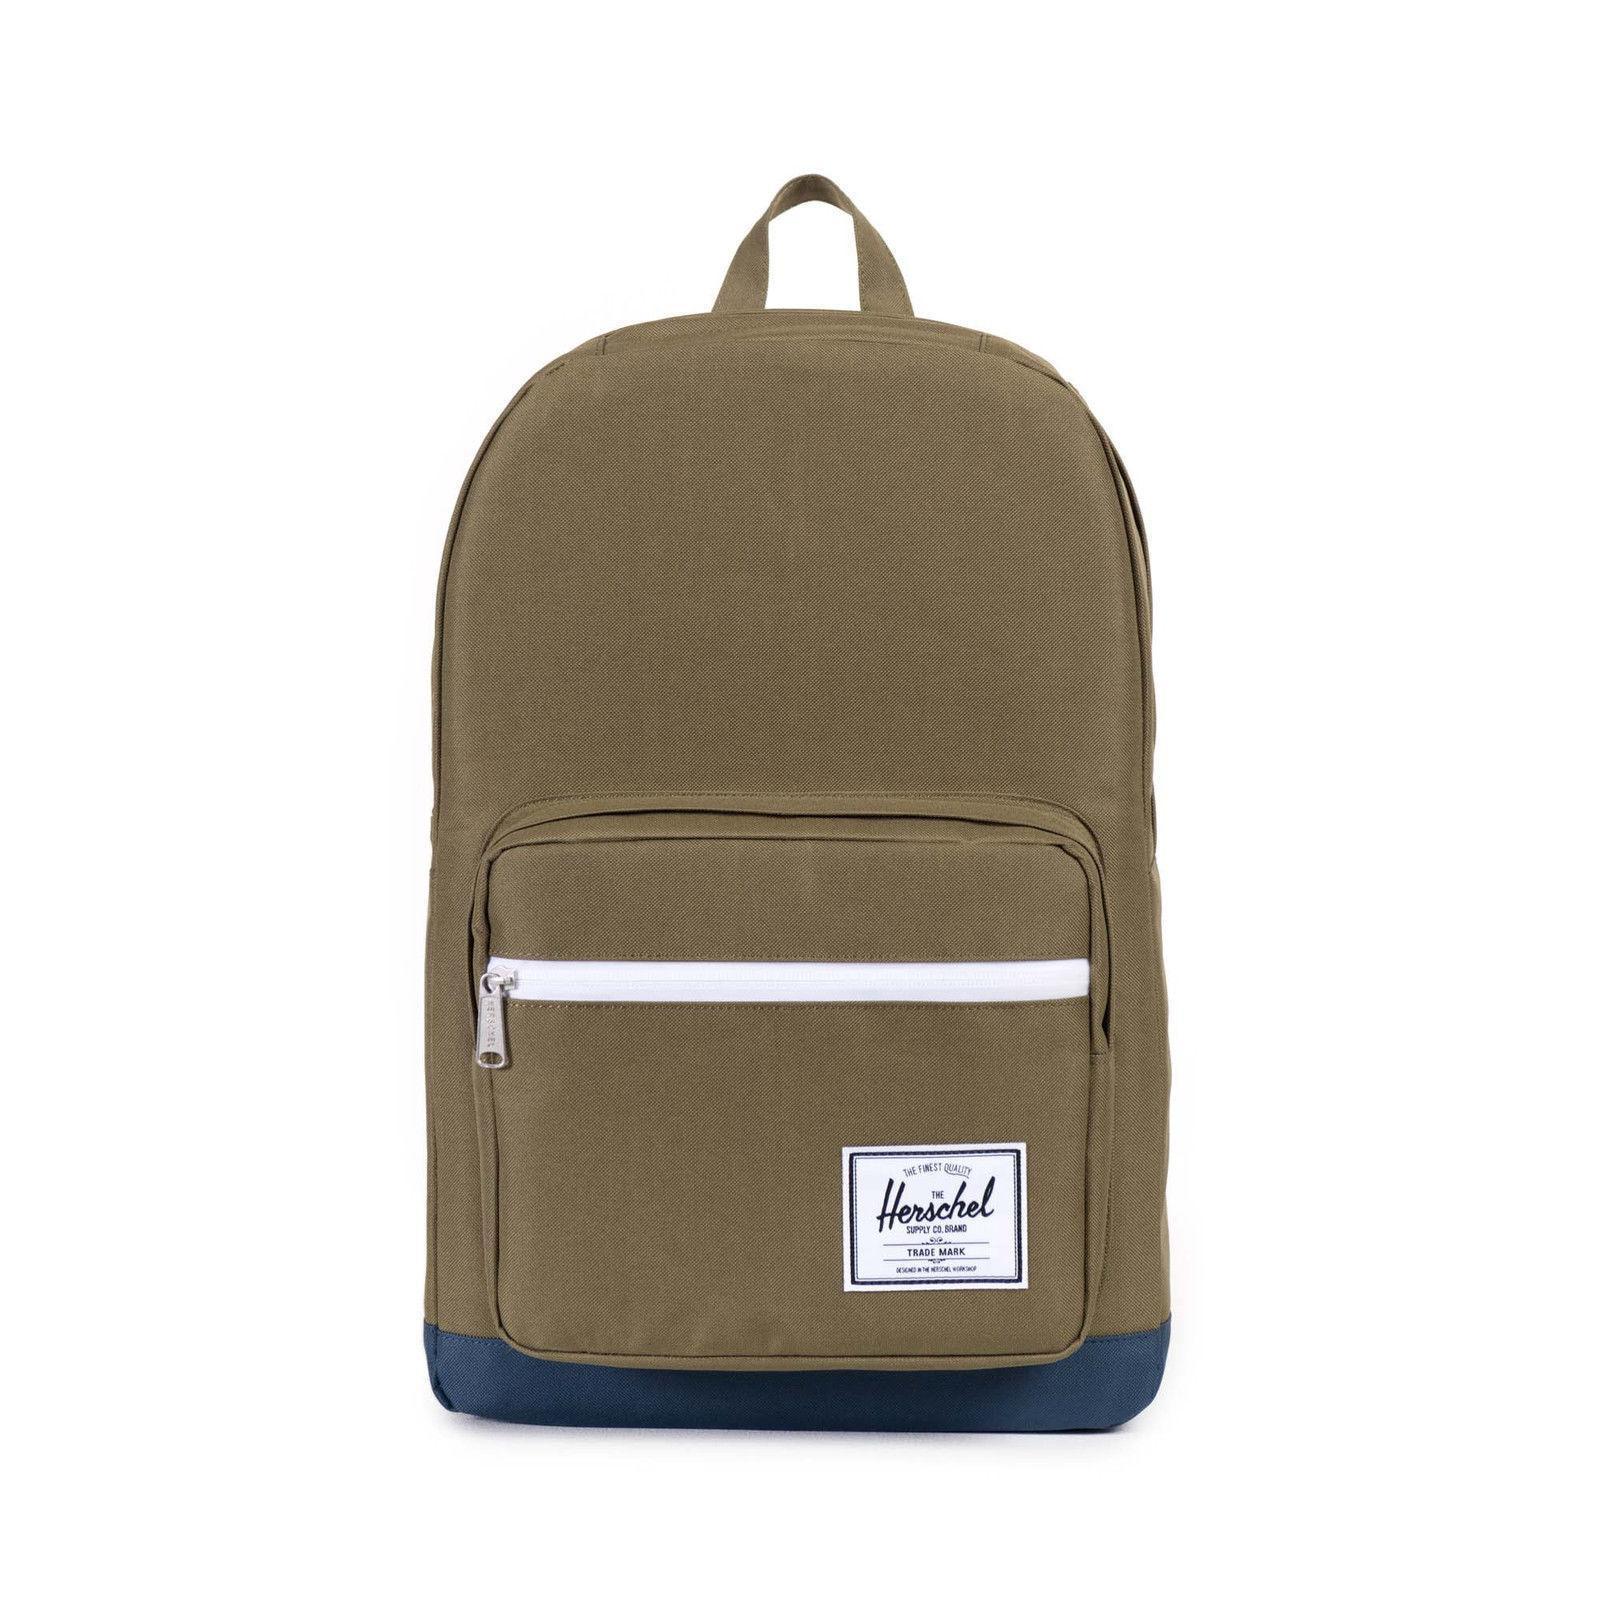 8d8109a91bb  Herschel Supply Co.  Waterproof Pop Quiz 22L UNISEX Laptop Backpack